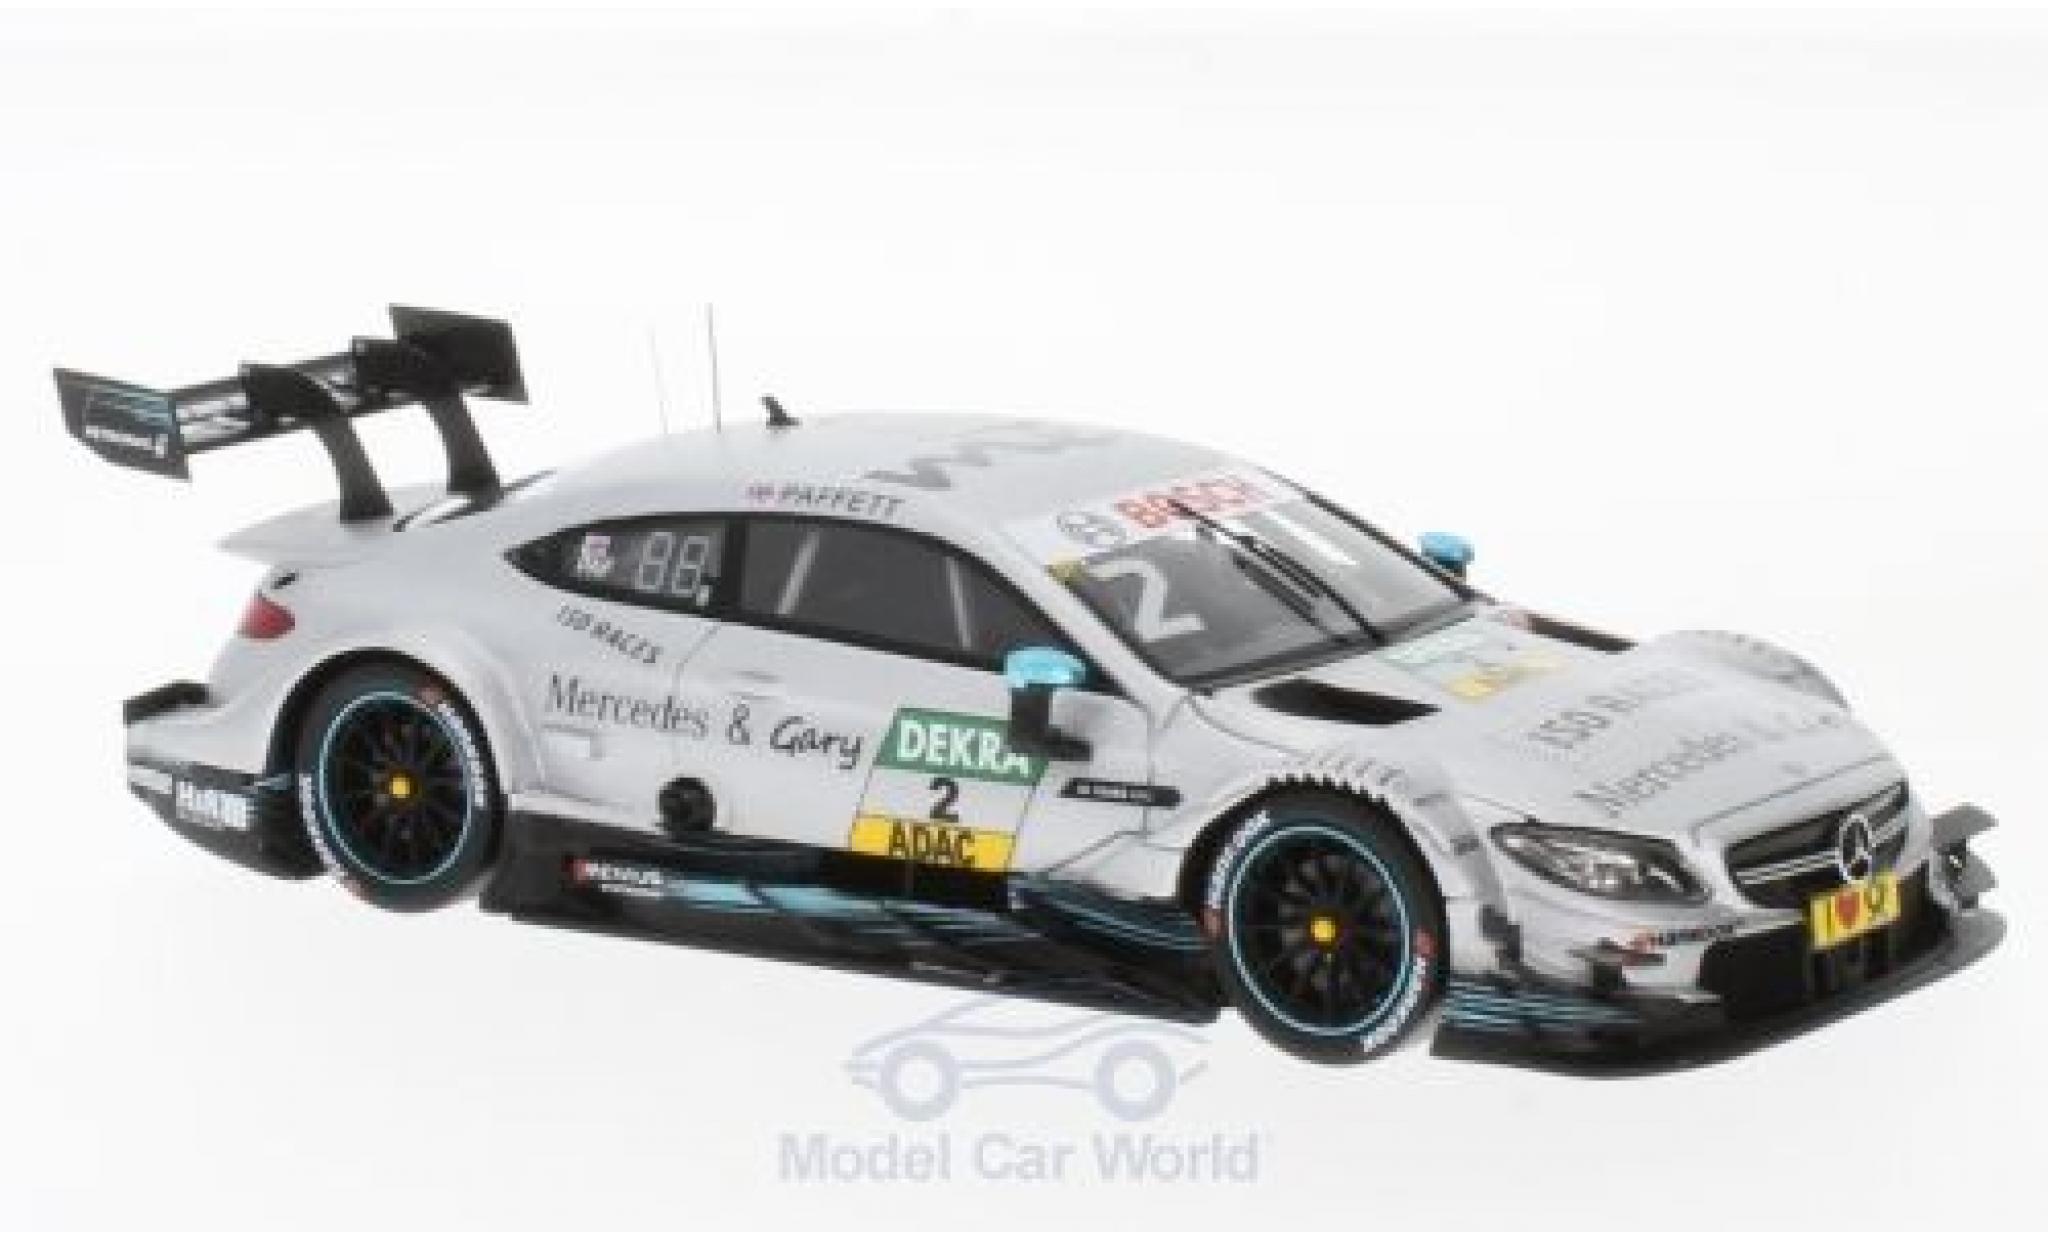 Mercedes Classe C DTM 1/43 Spark AMG C 63 No.2 -AMG Team HWA Lausitzring 2017 150 Races & Gary G.Paffett